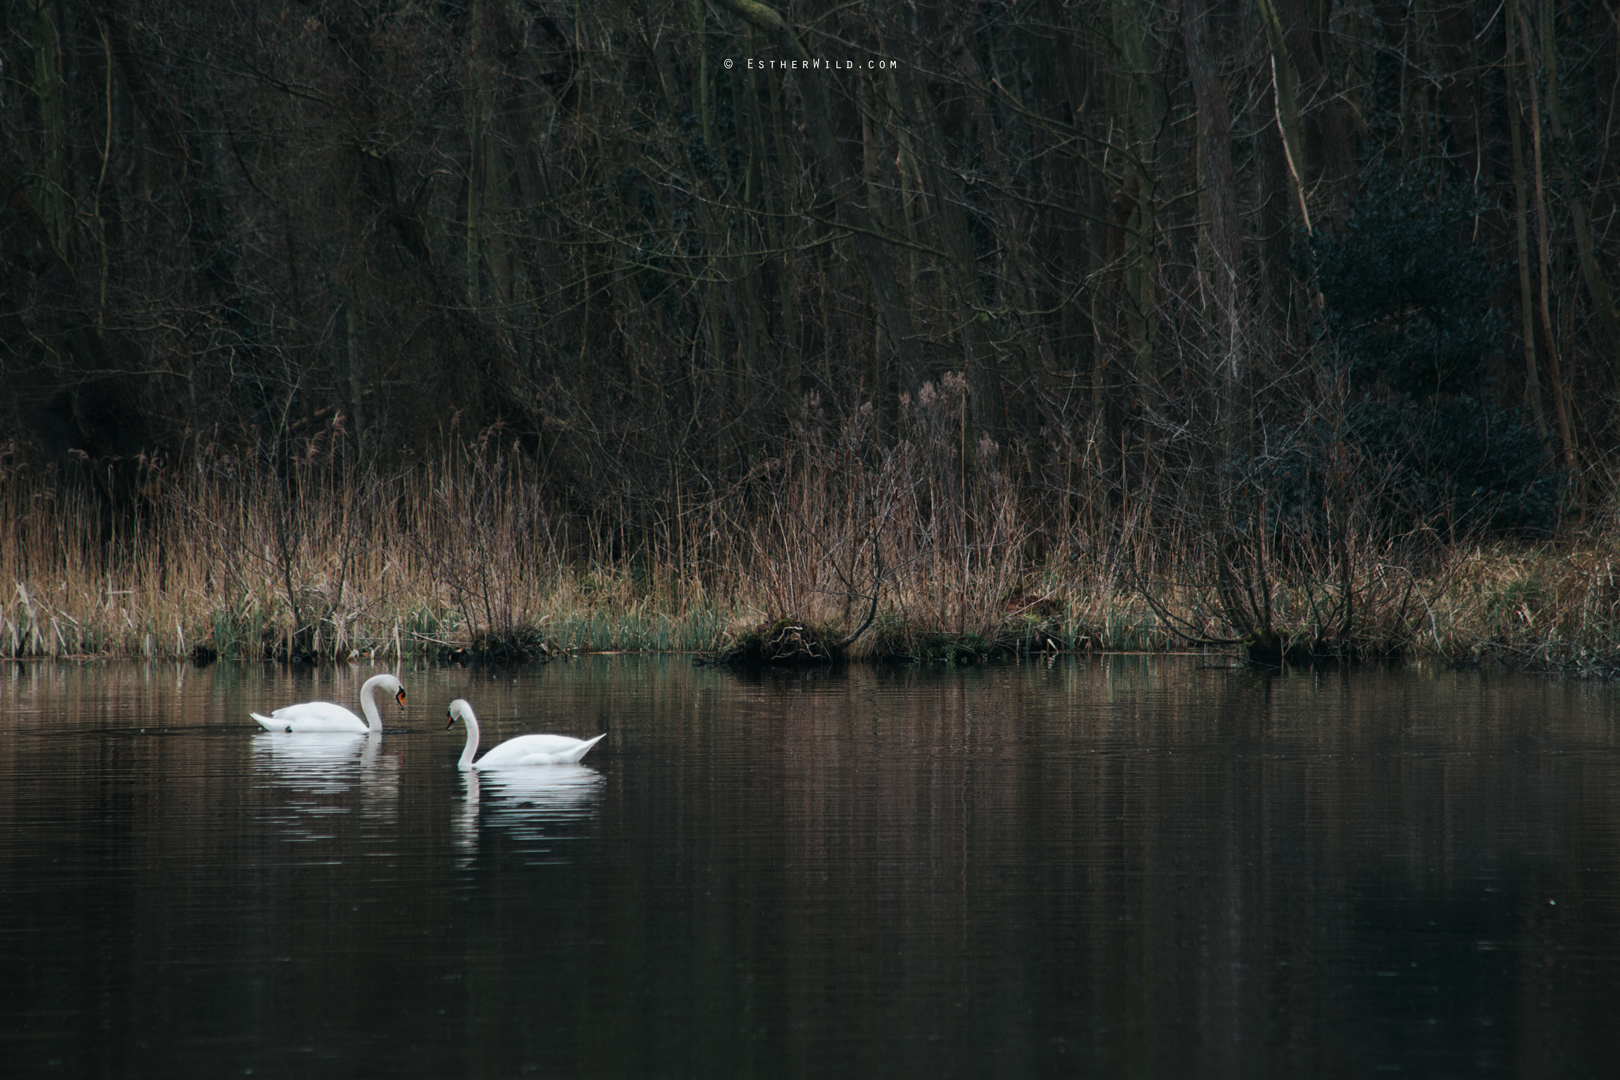 The_BoatHouse_Wedding_Venue_Ormesby_Norfolk_Broads_Boat_Wedding_Photography_Esther_Wild_Photographer_IMG_0184.jpg